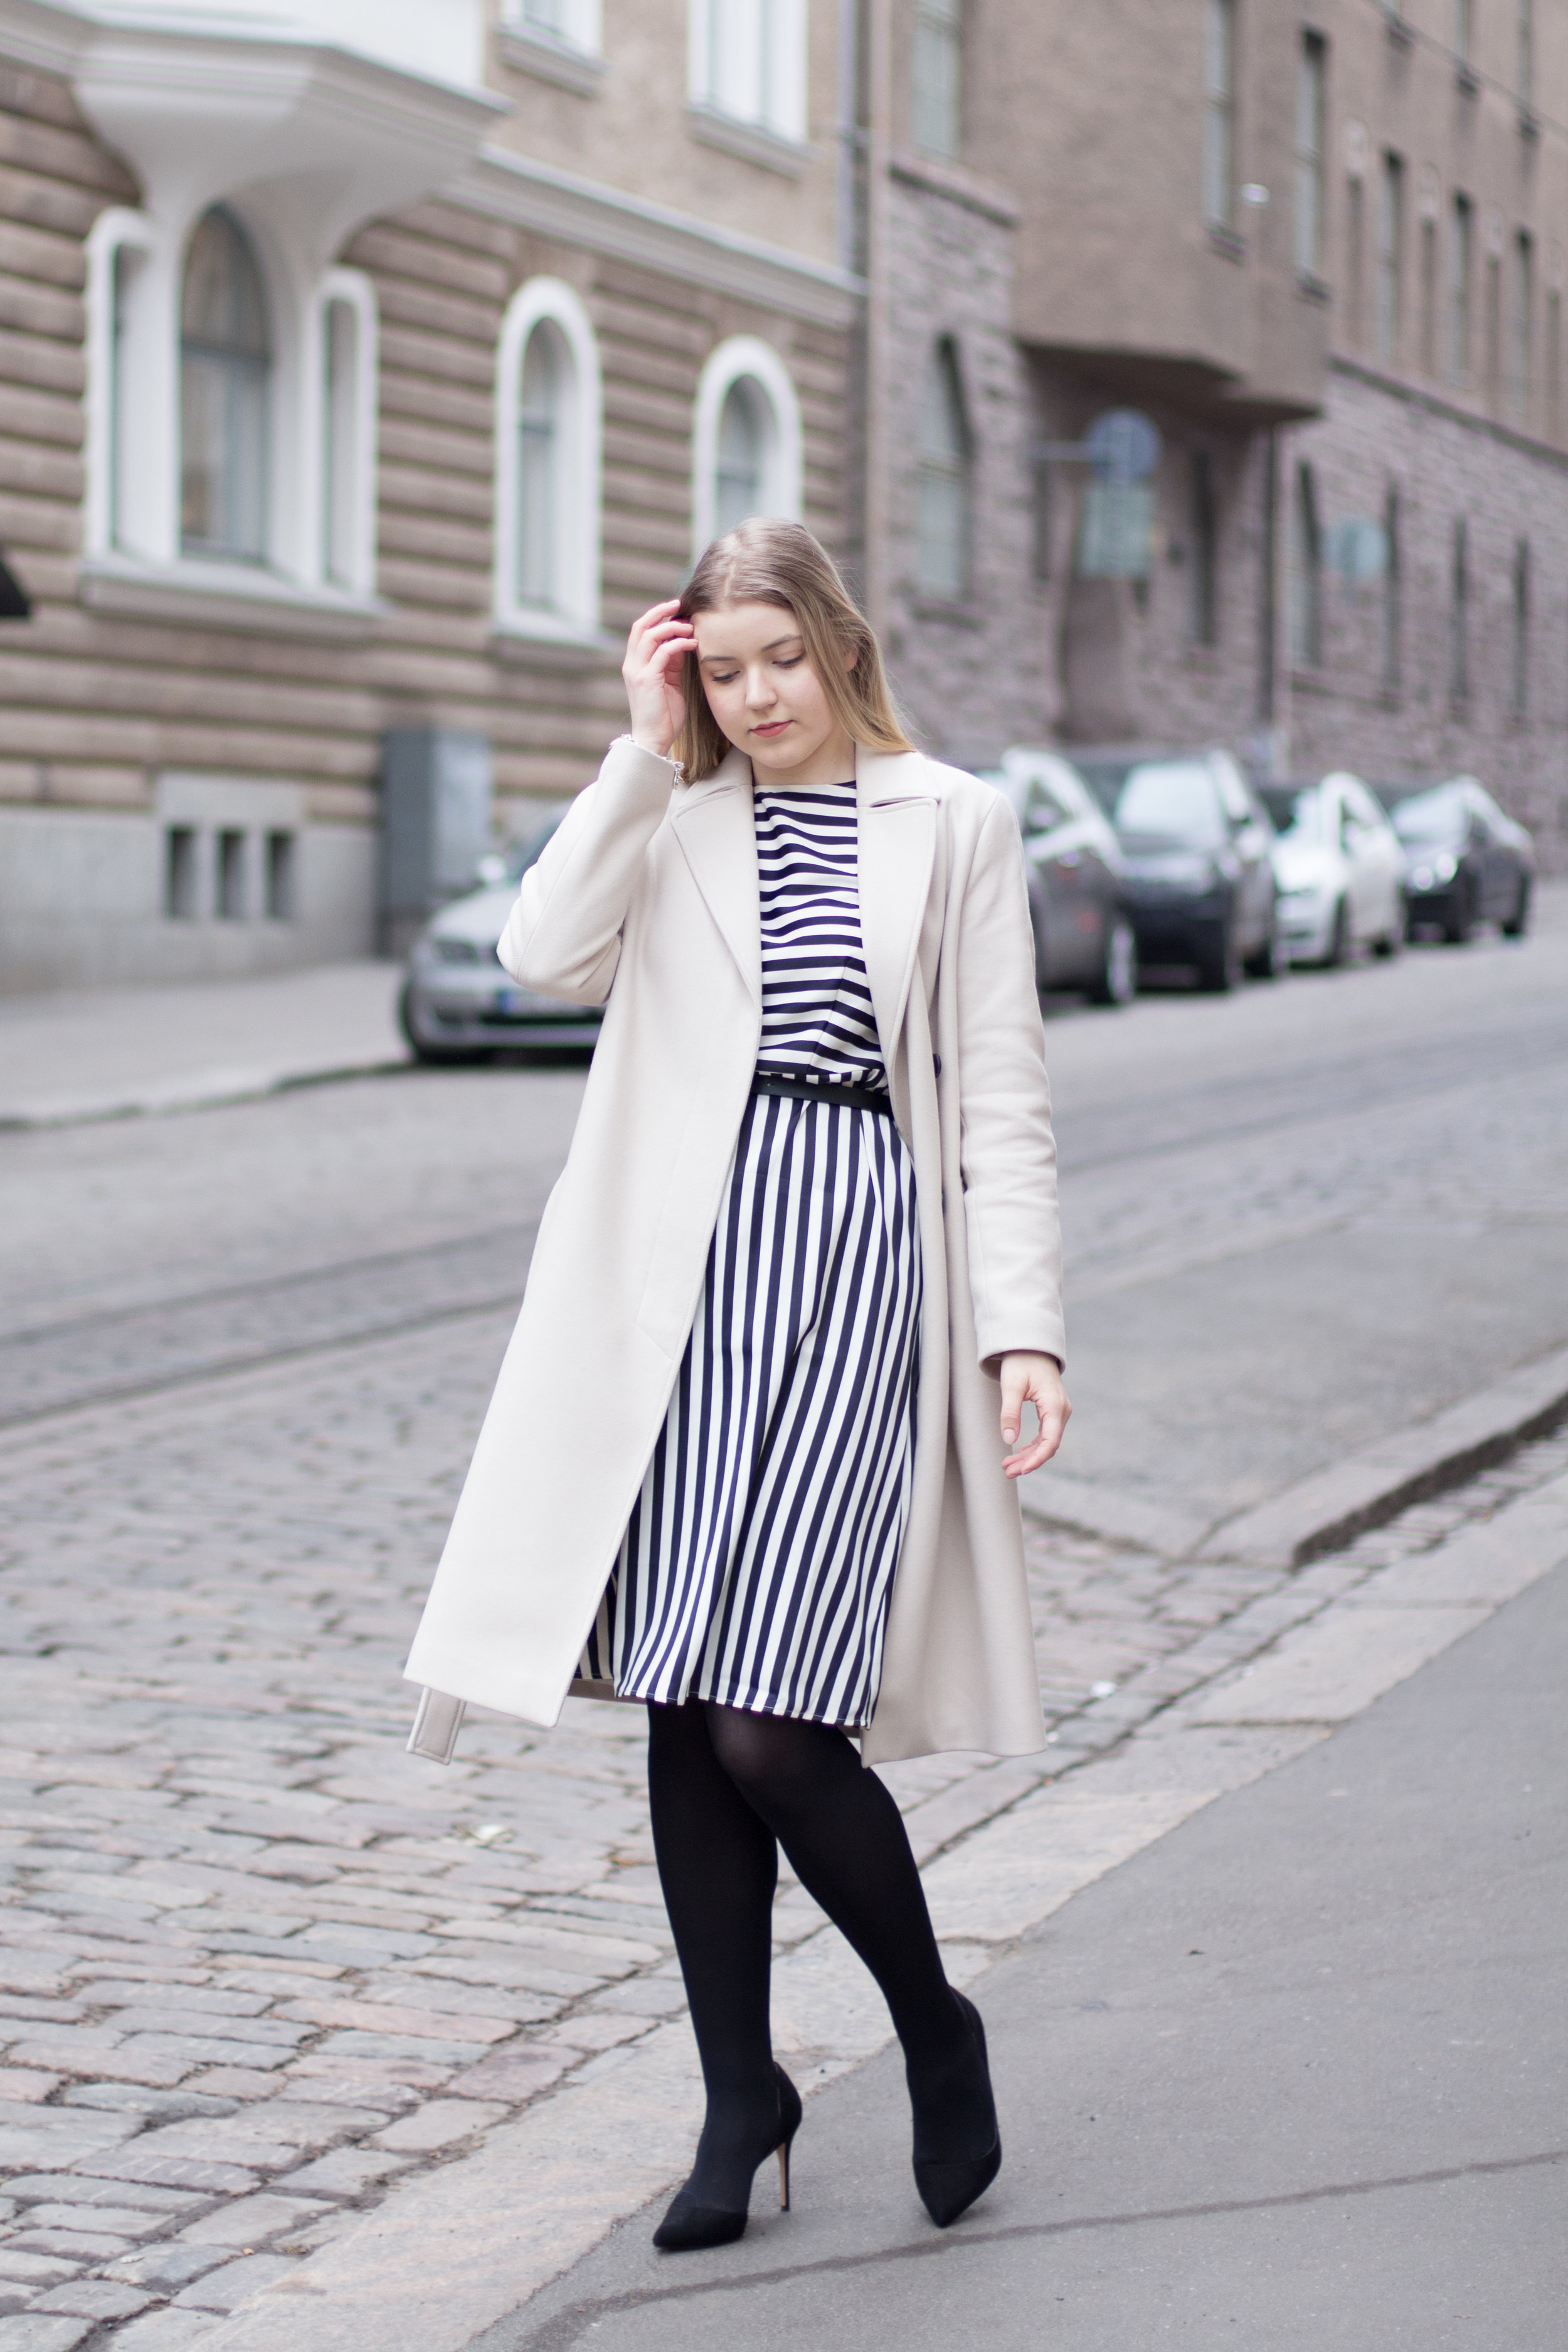 black and white dress (3 of 13).jpg